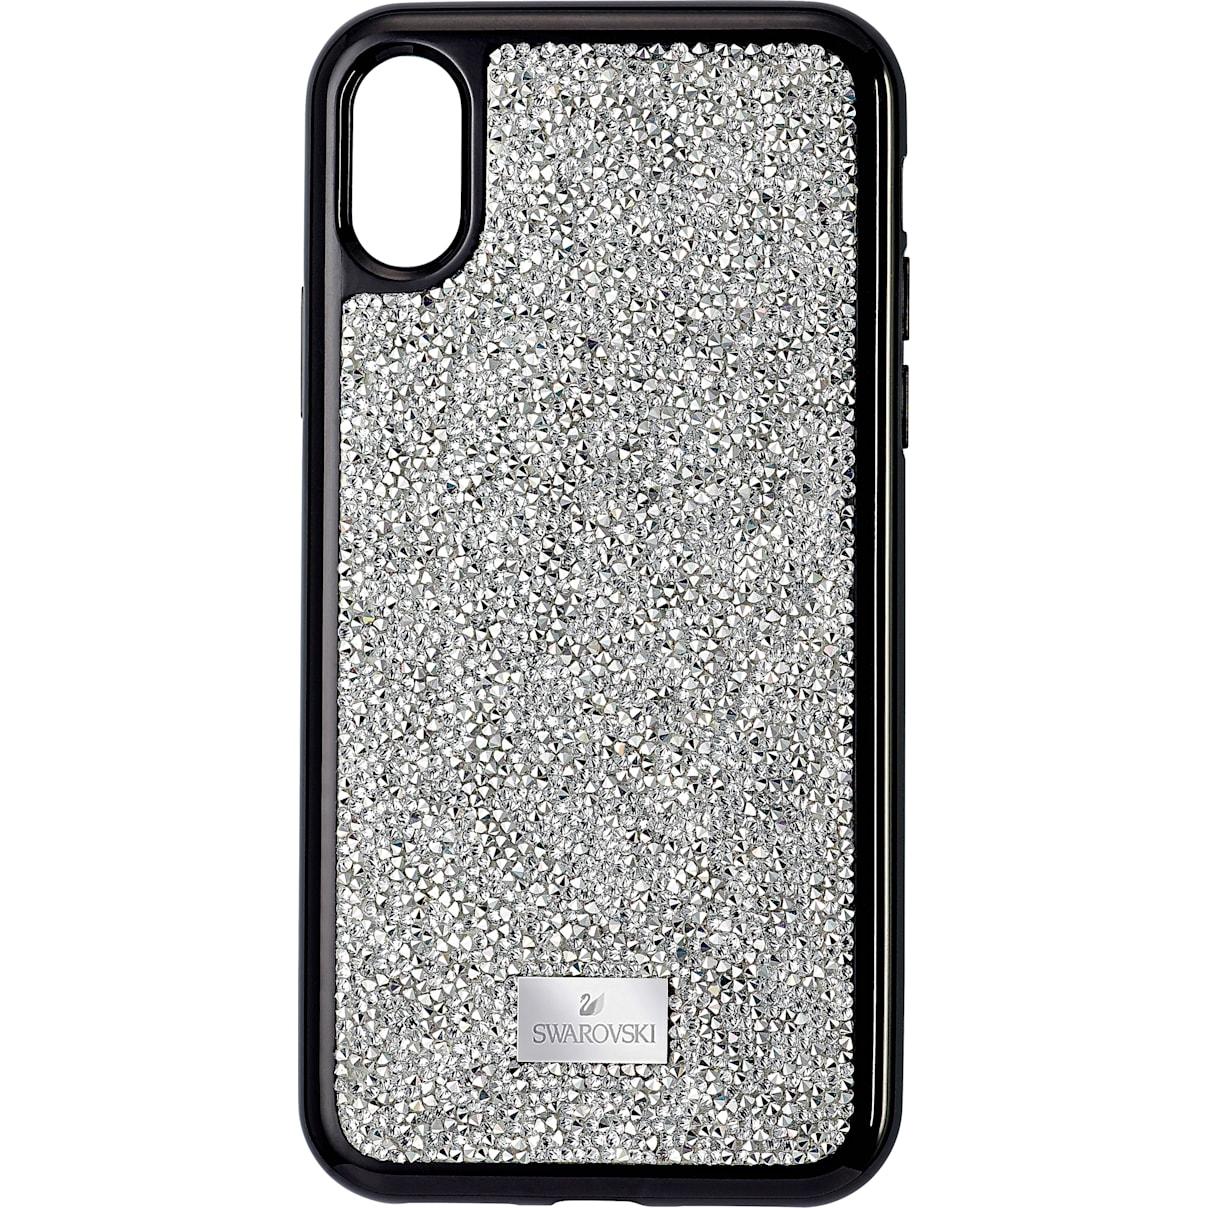 Swarovski Glam Rock Smartphone Case, iPhone® XS Max